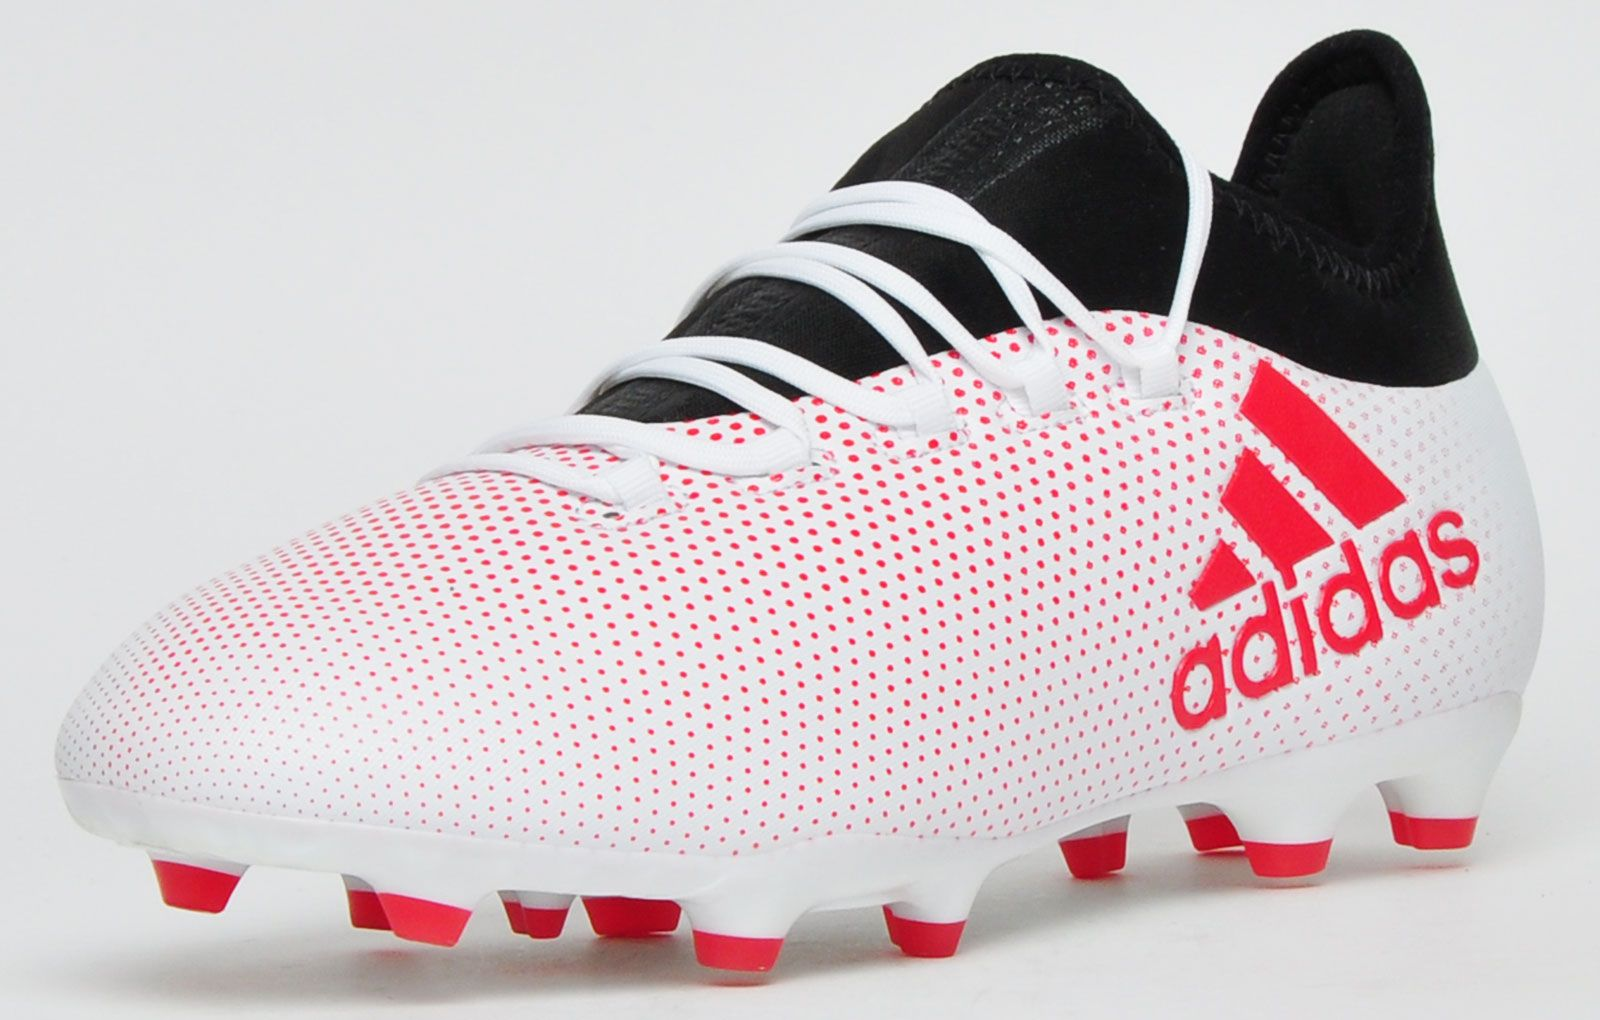 Adidas X 17.1 FG Junior